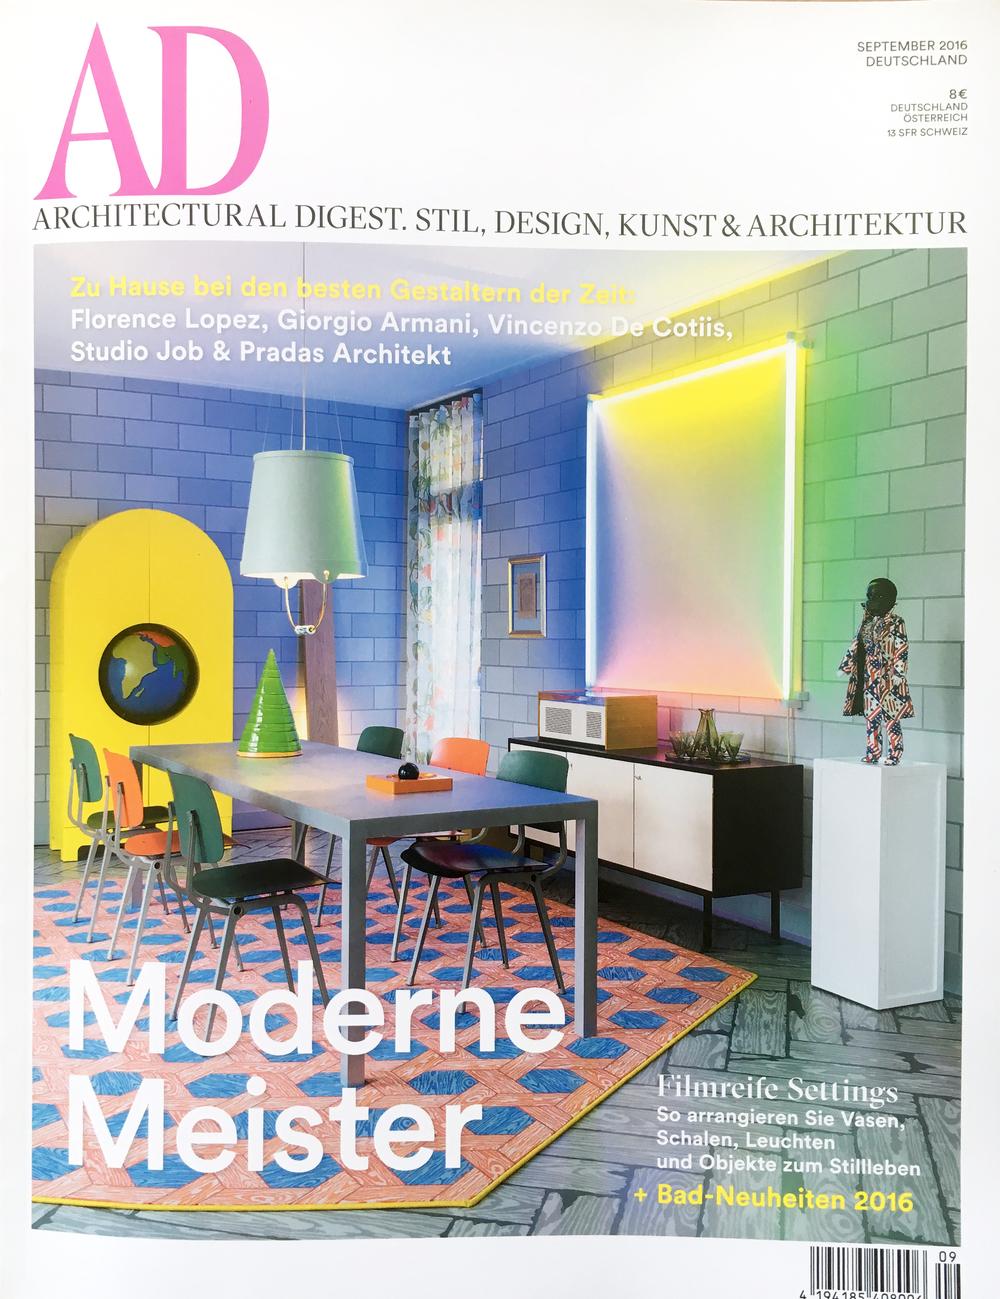 1608 AD Magazine_Beabuehler.jpg